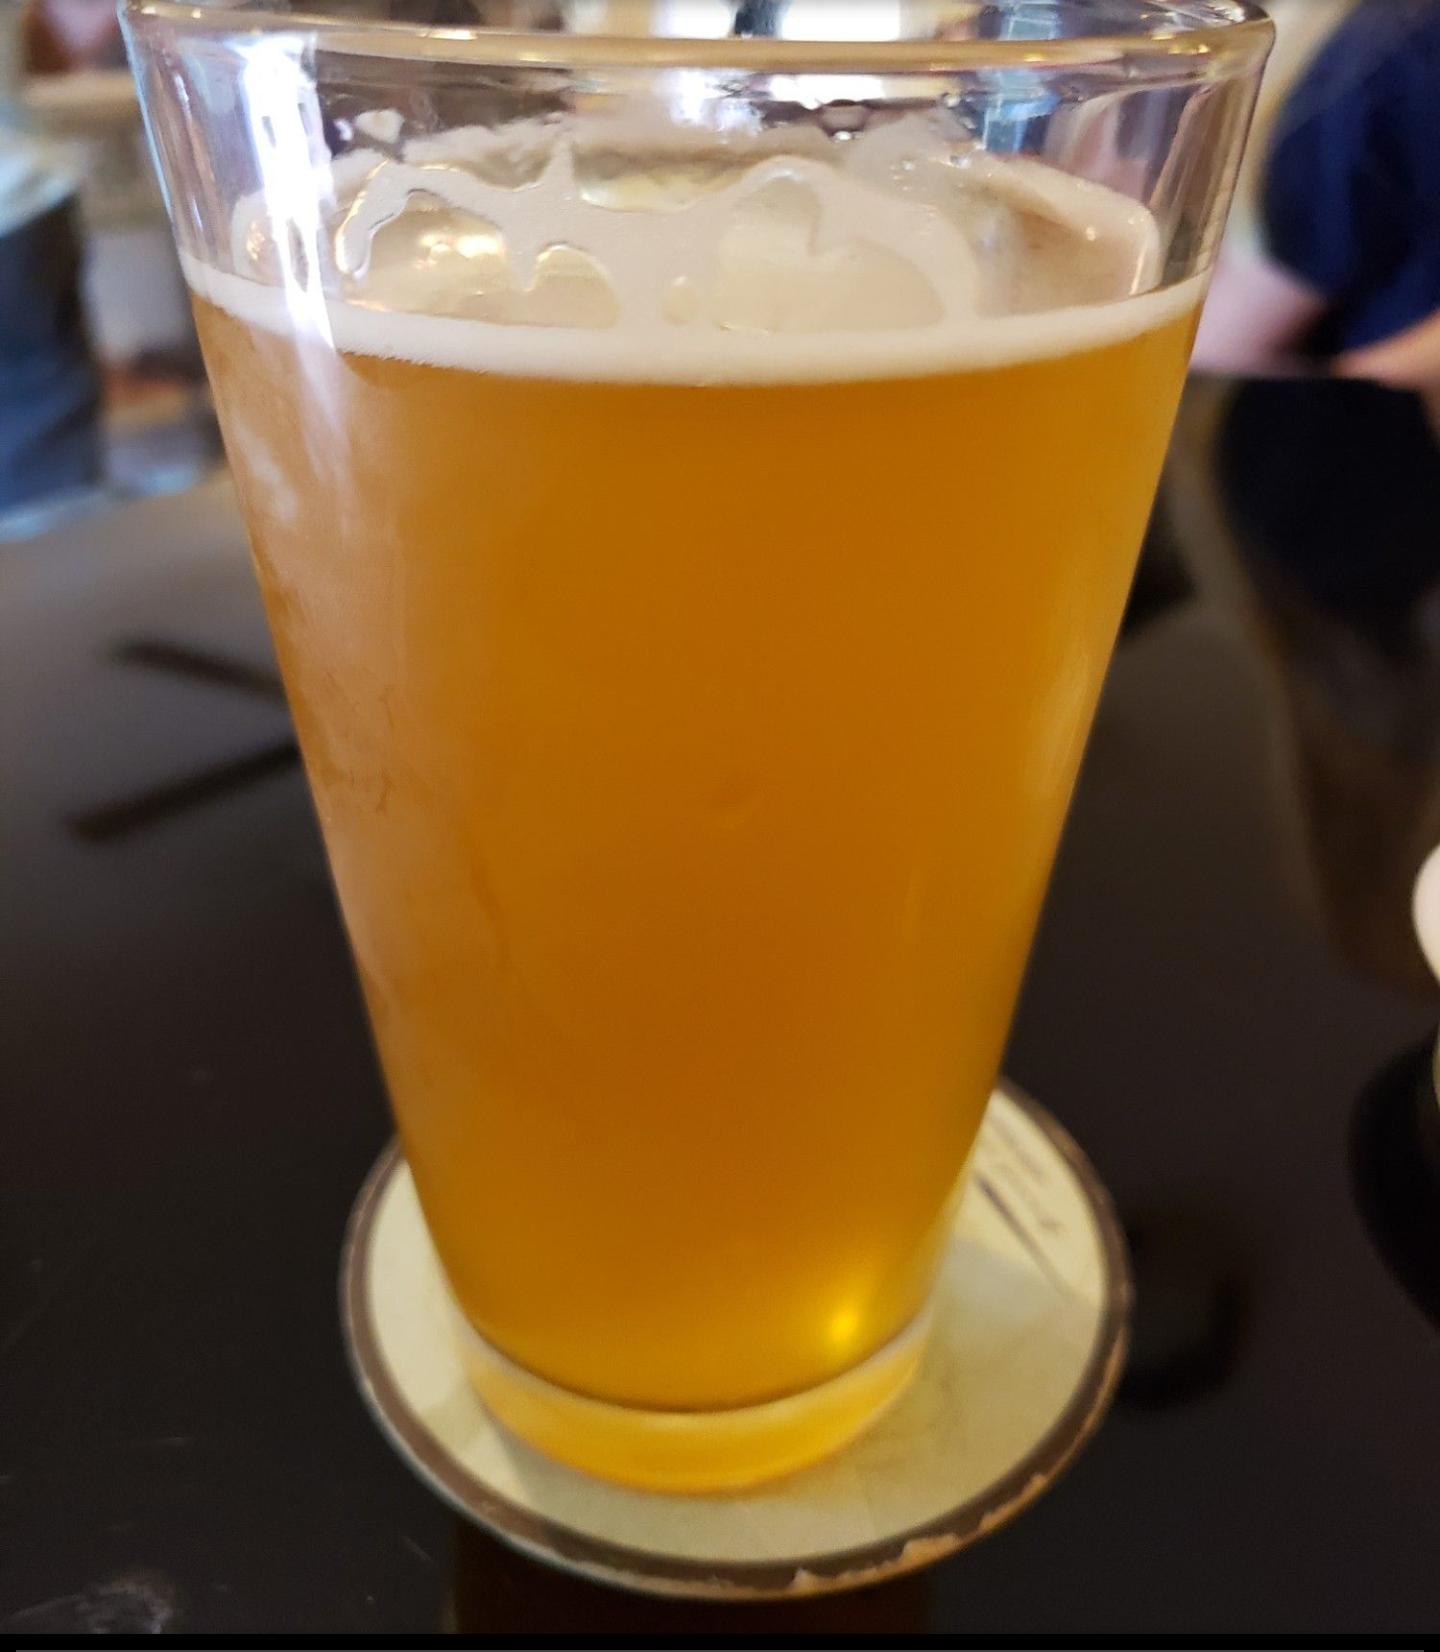 Whitecap American White Ale